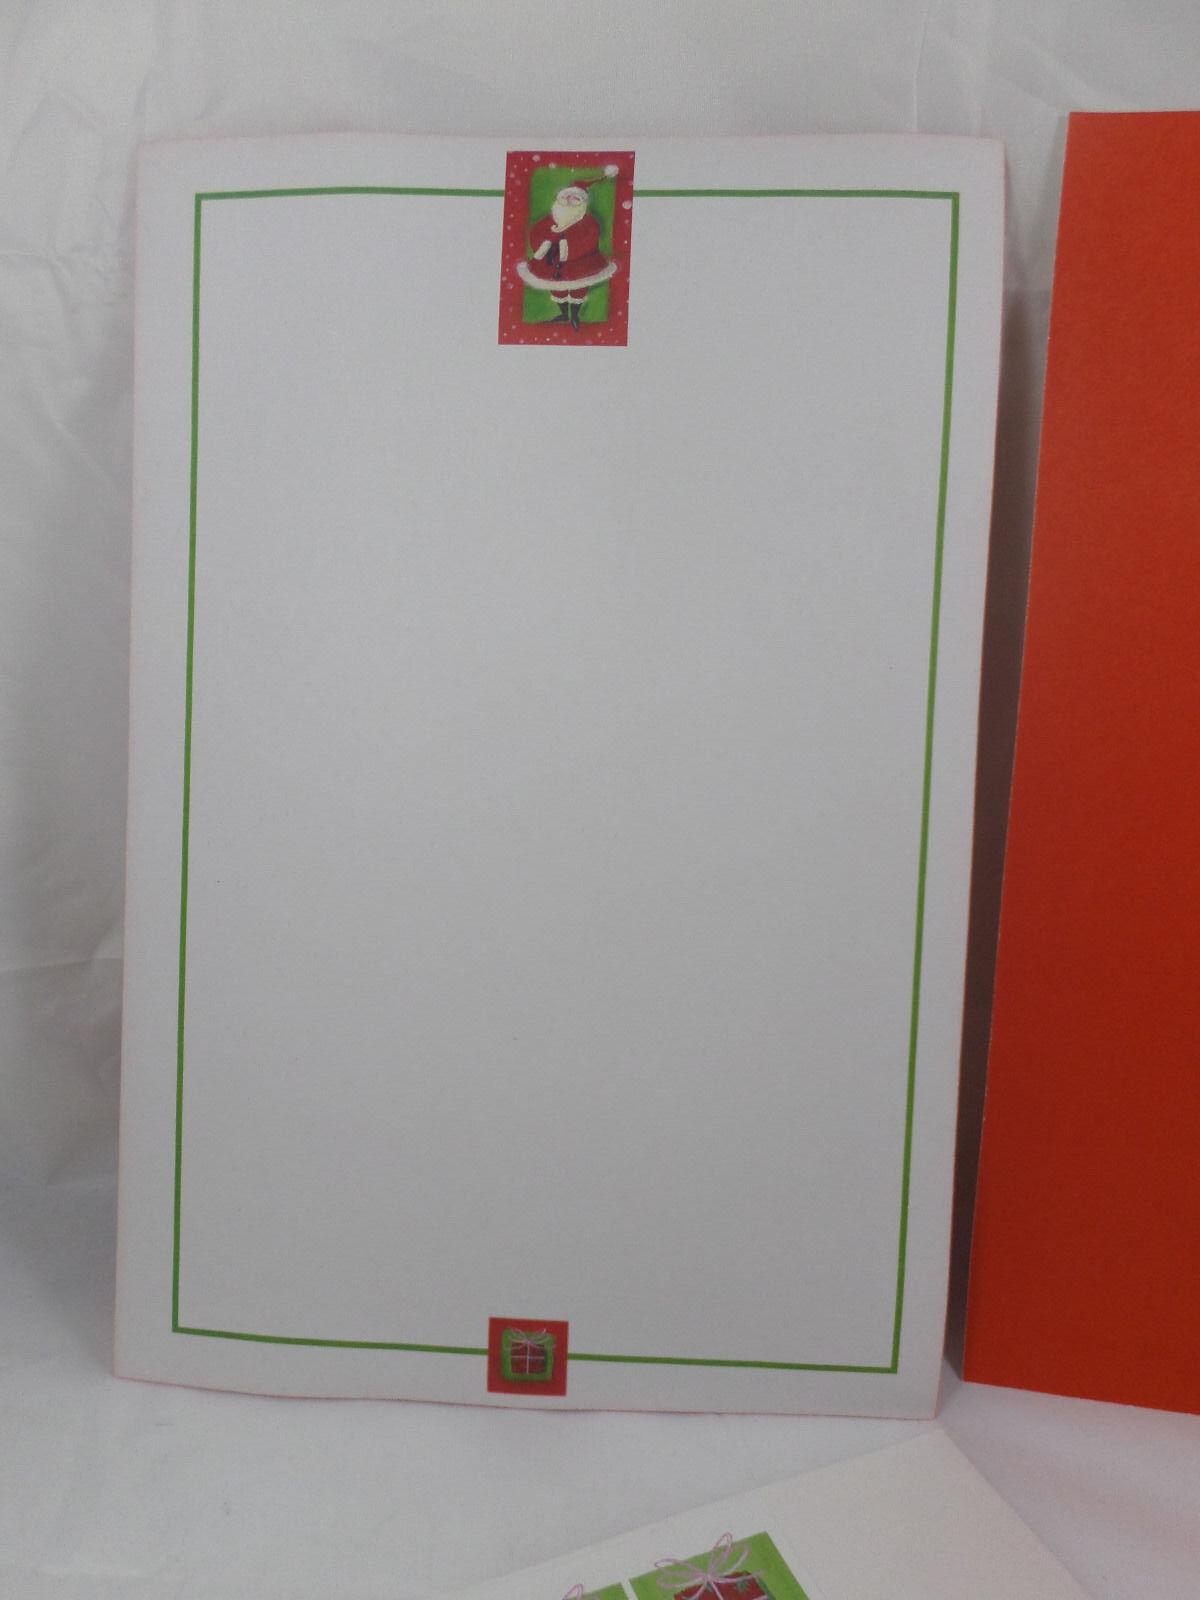 30 Schnauzer Christmas cards seals envelopes 90 pieces Santa Paws design